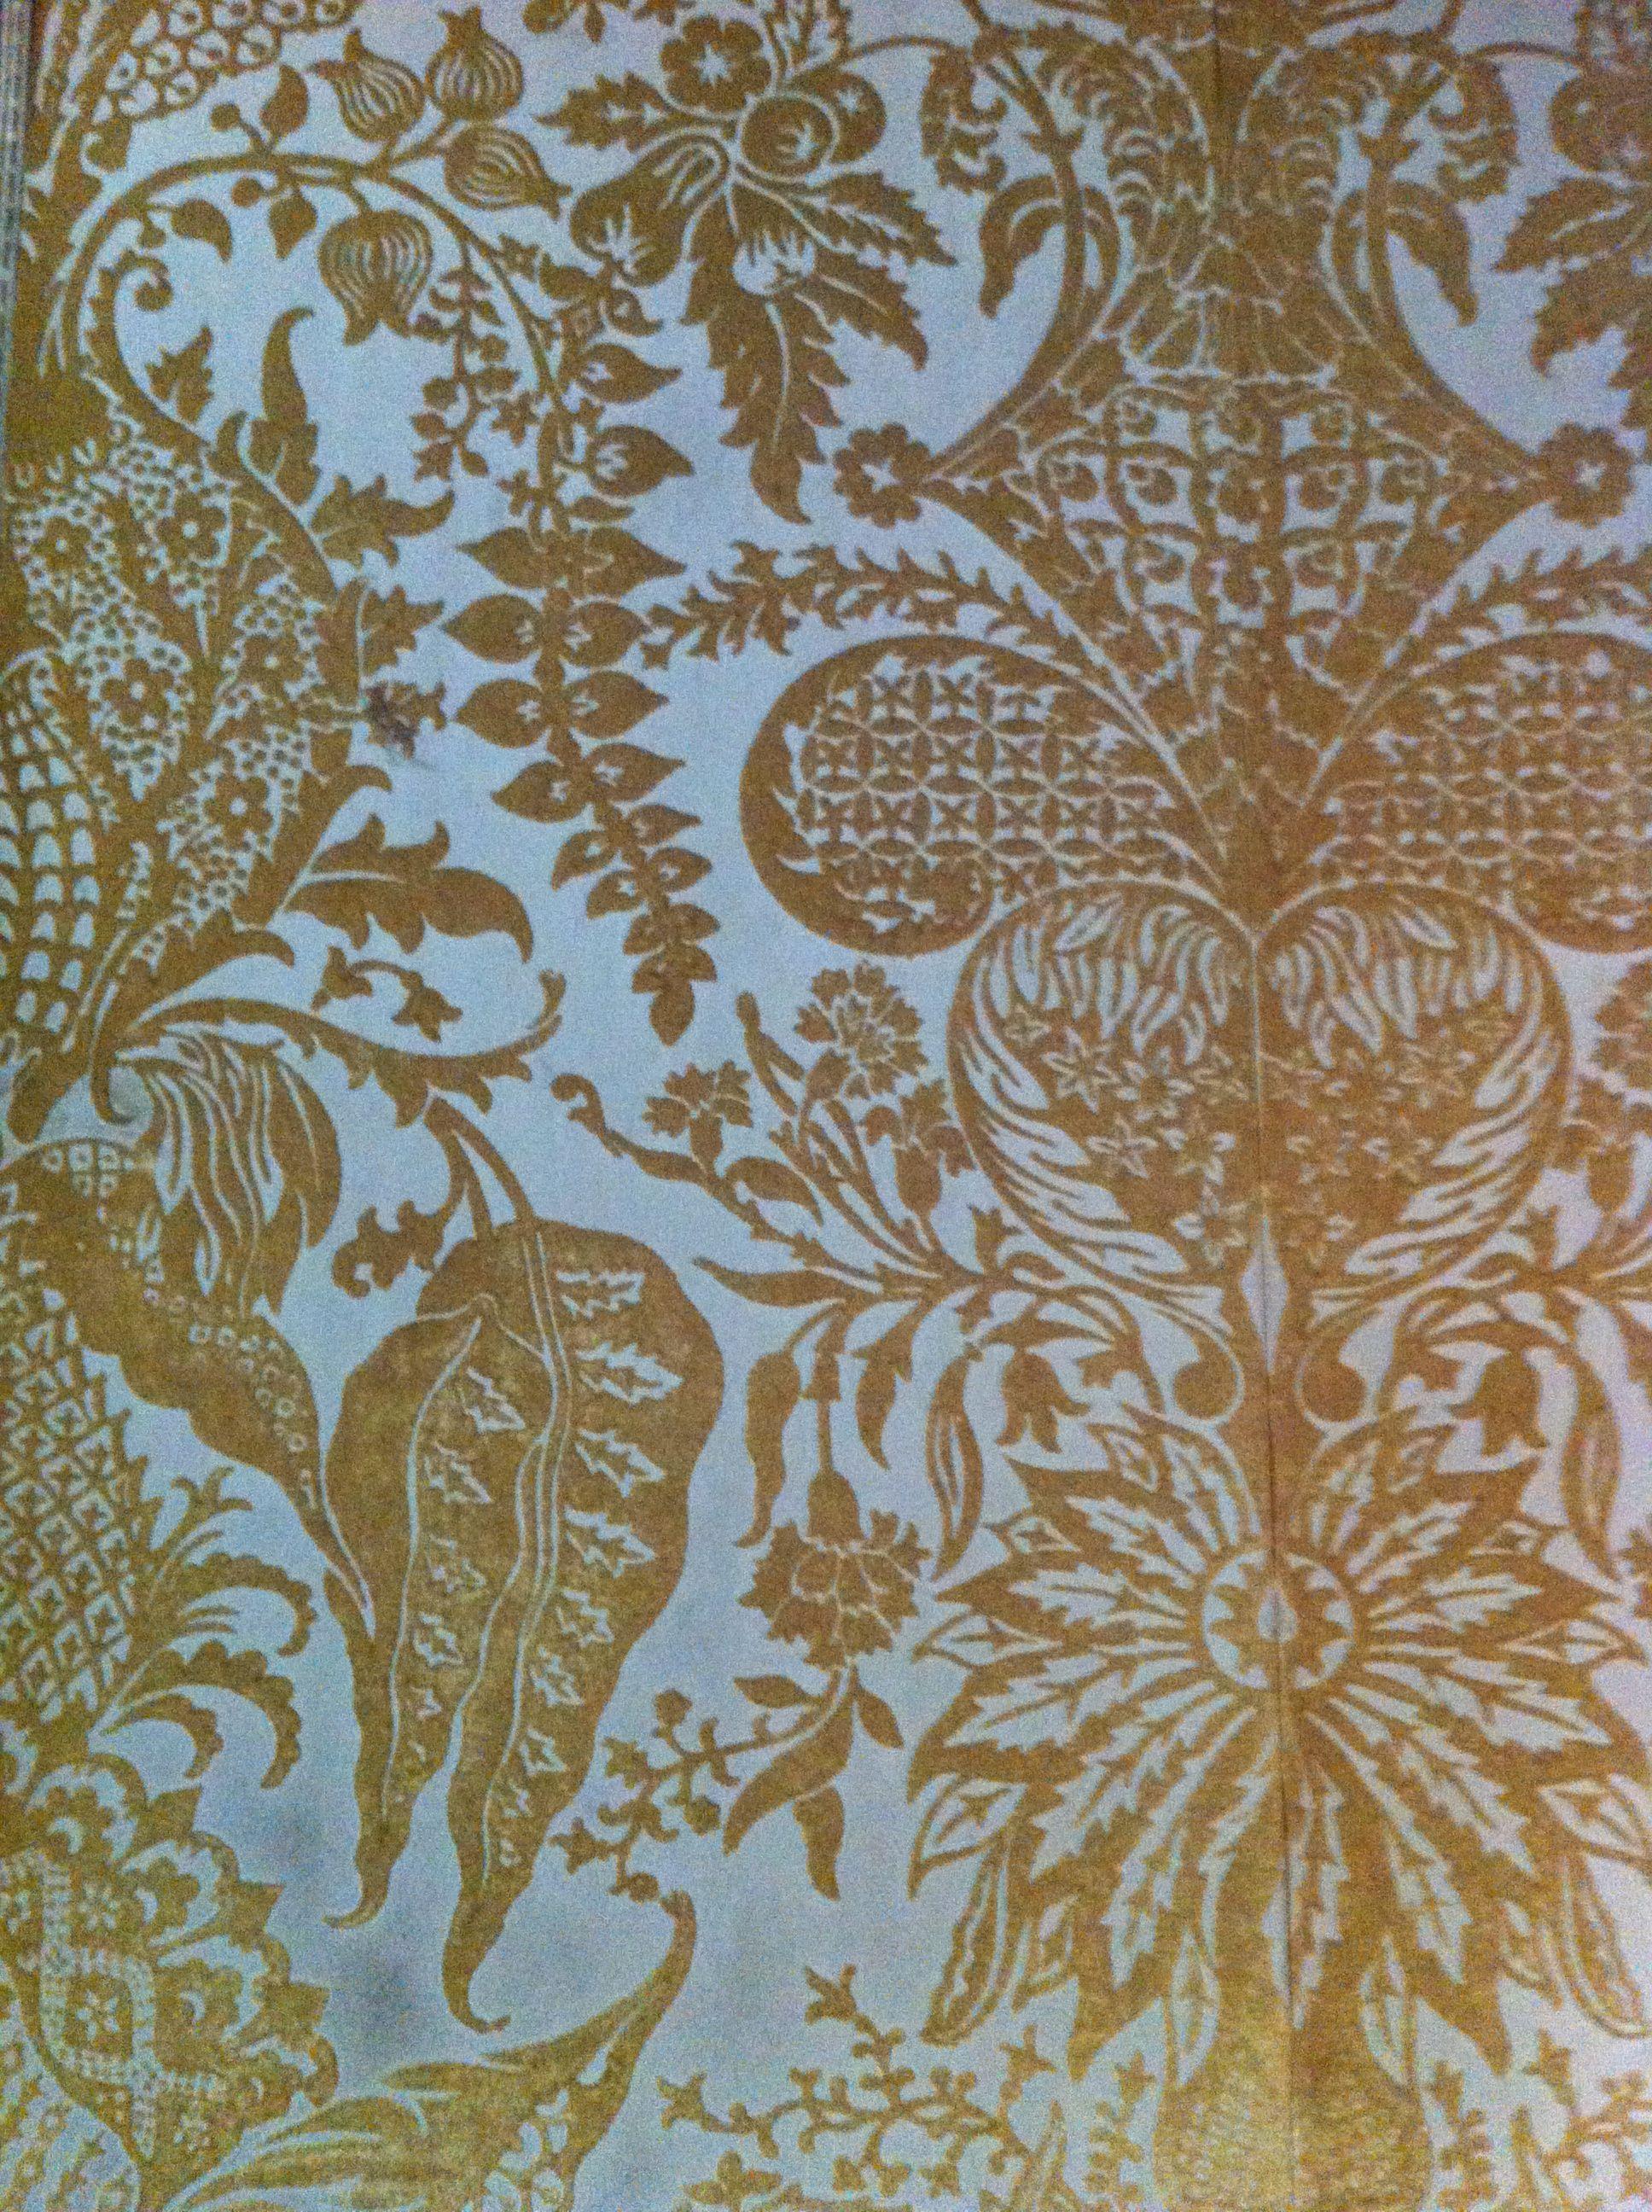 home wallpaper barocco - photo #10